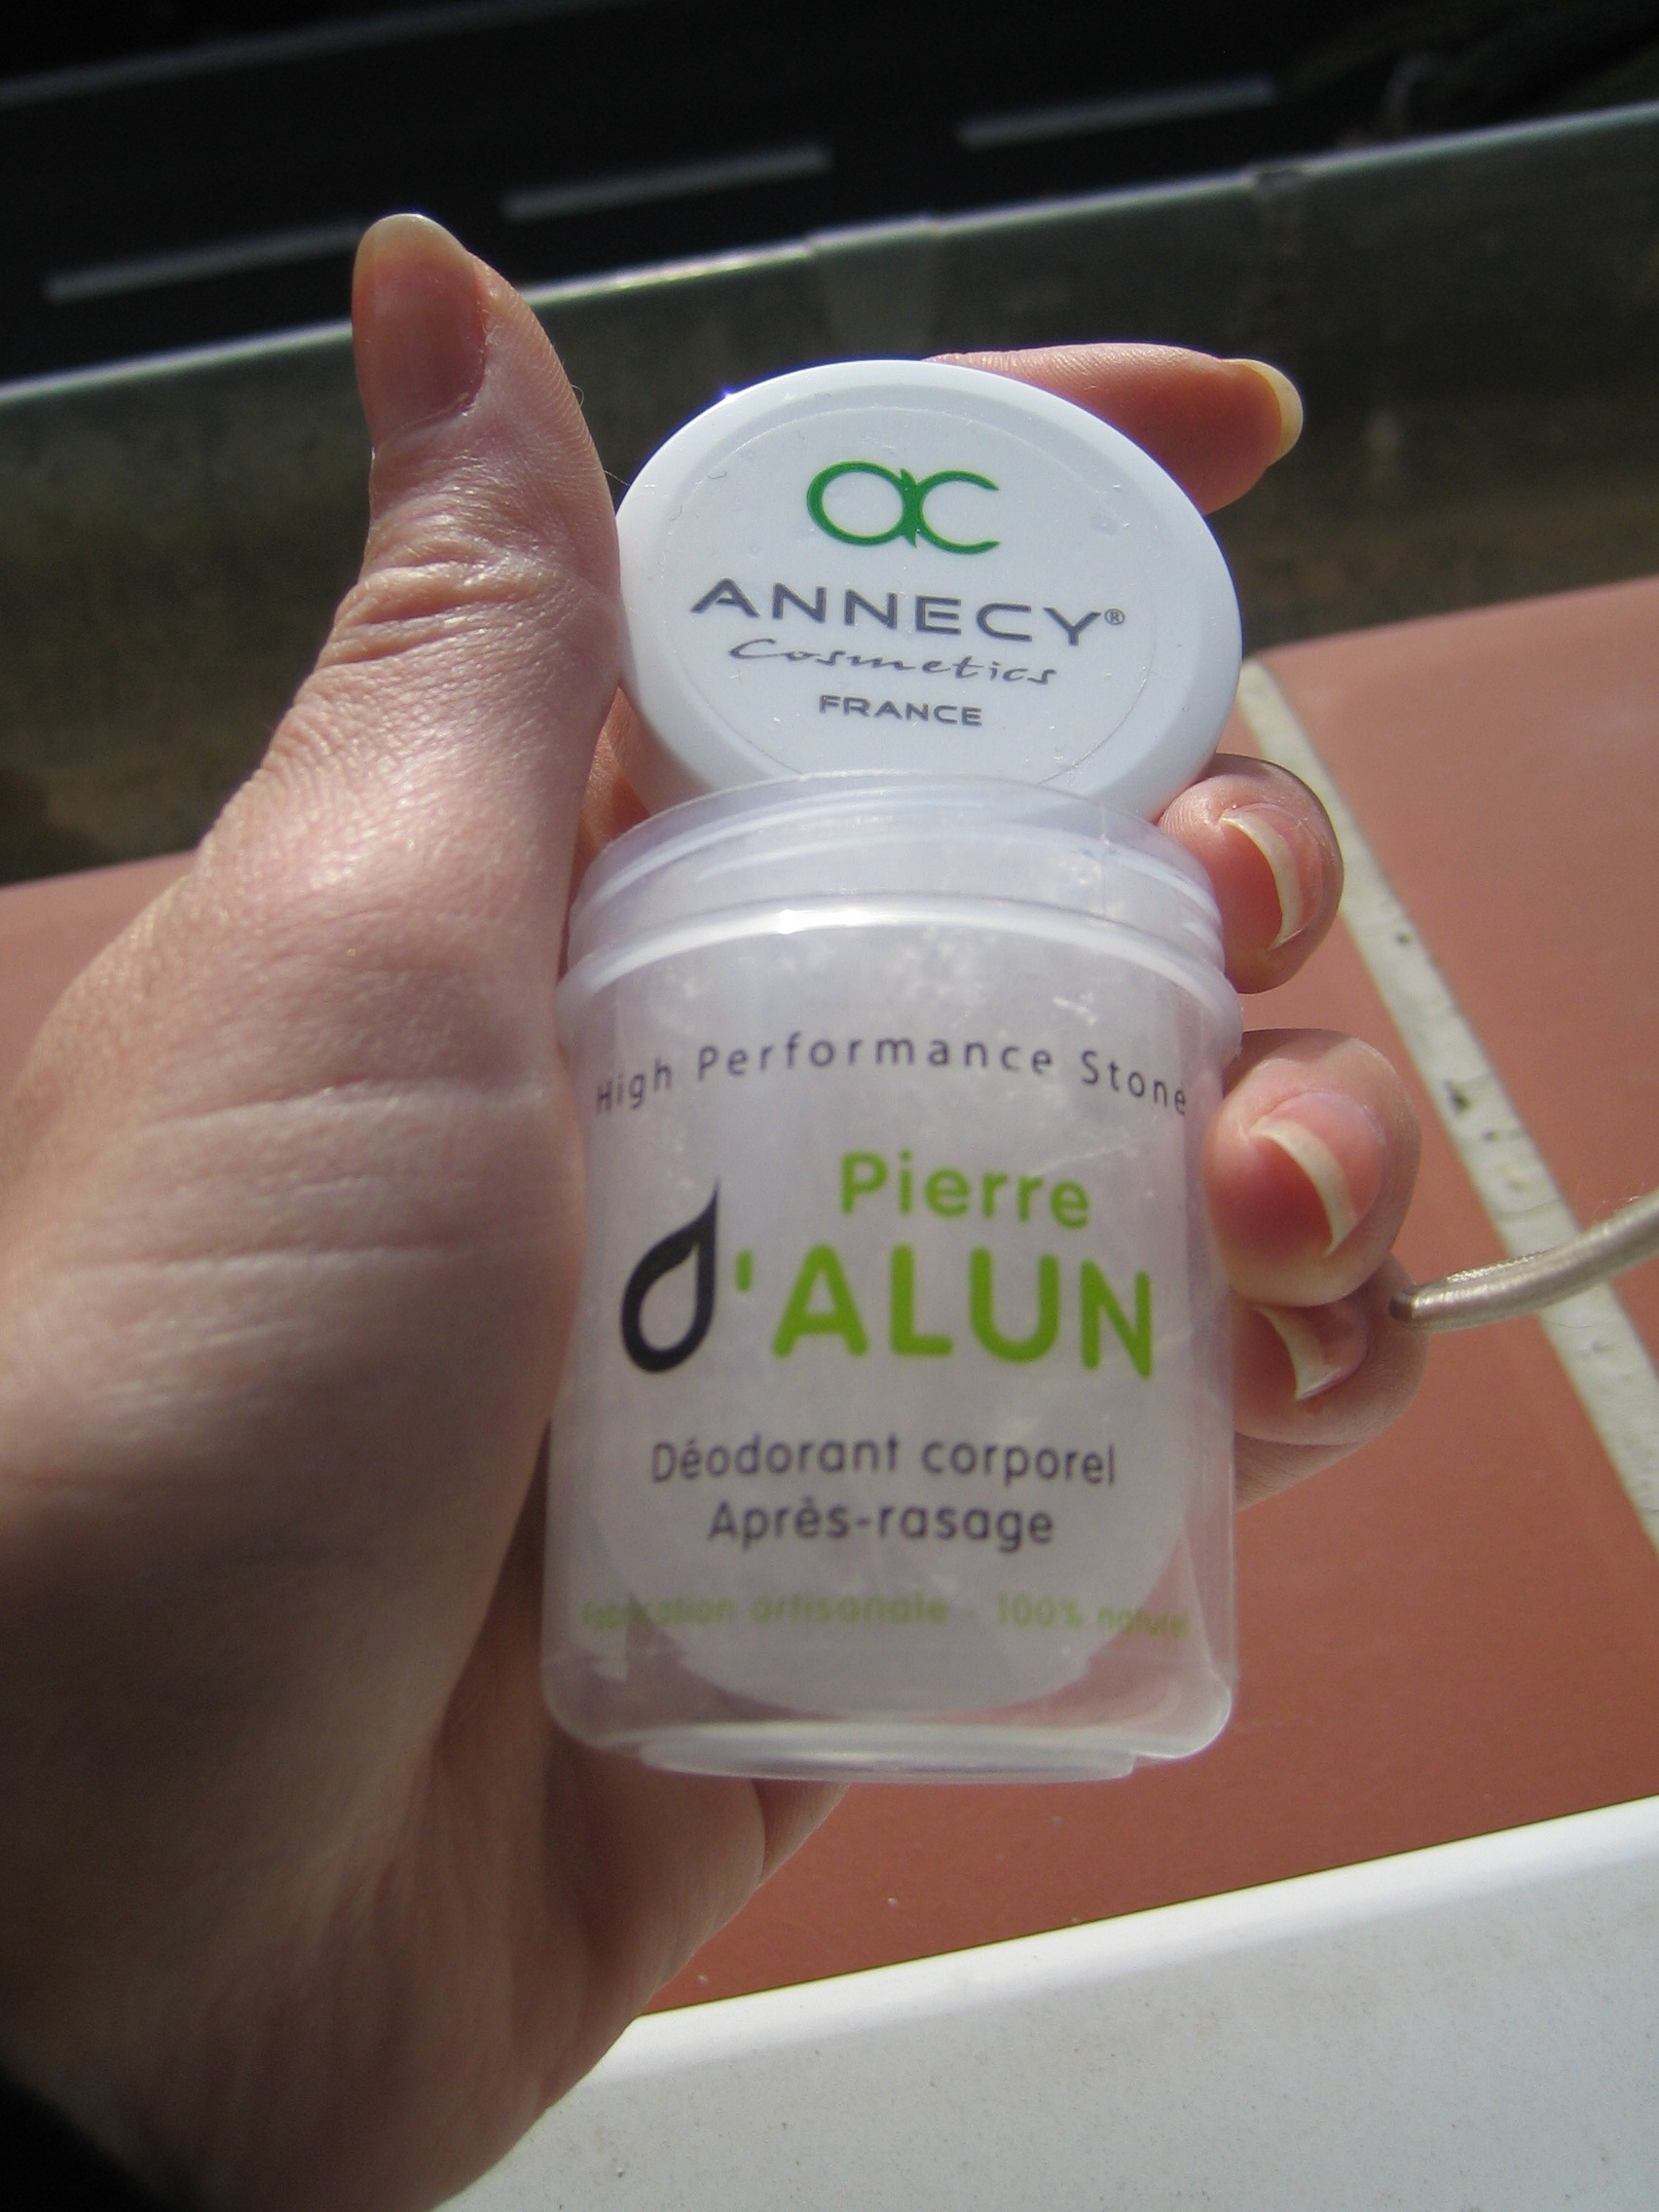 Annecy Cosmetics - pierre d'alun